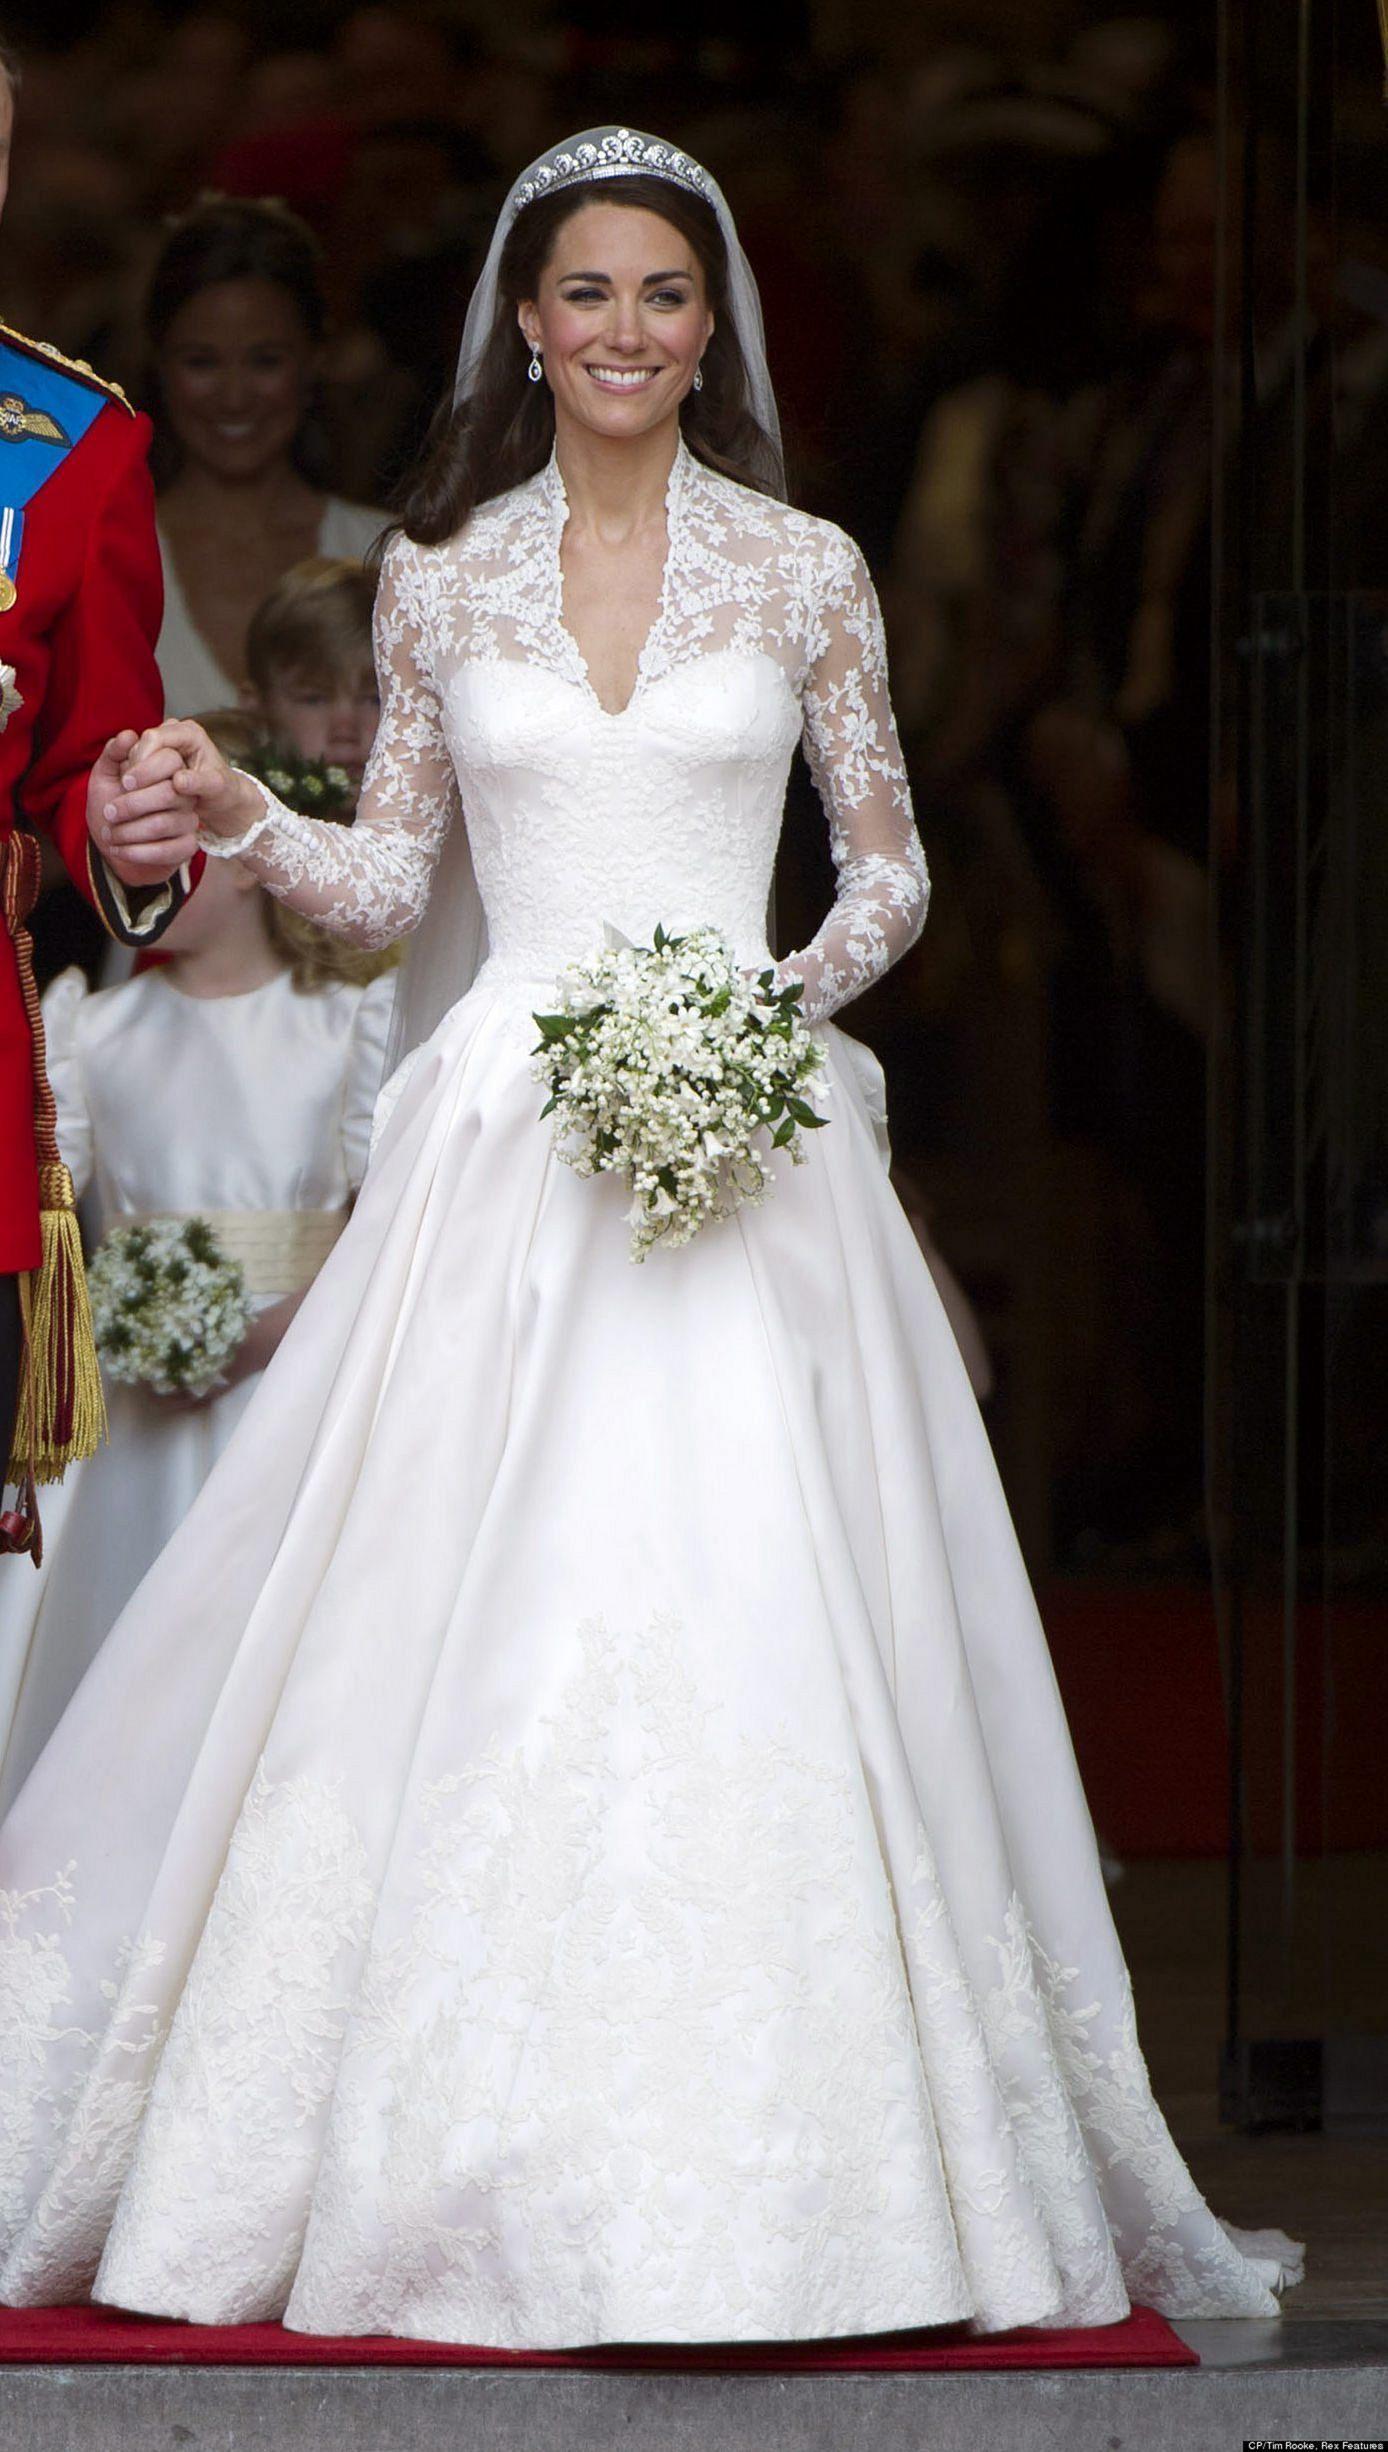 Best Princess Wedding Dresses Ideas: 50+ Awesome Inspirations ...